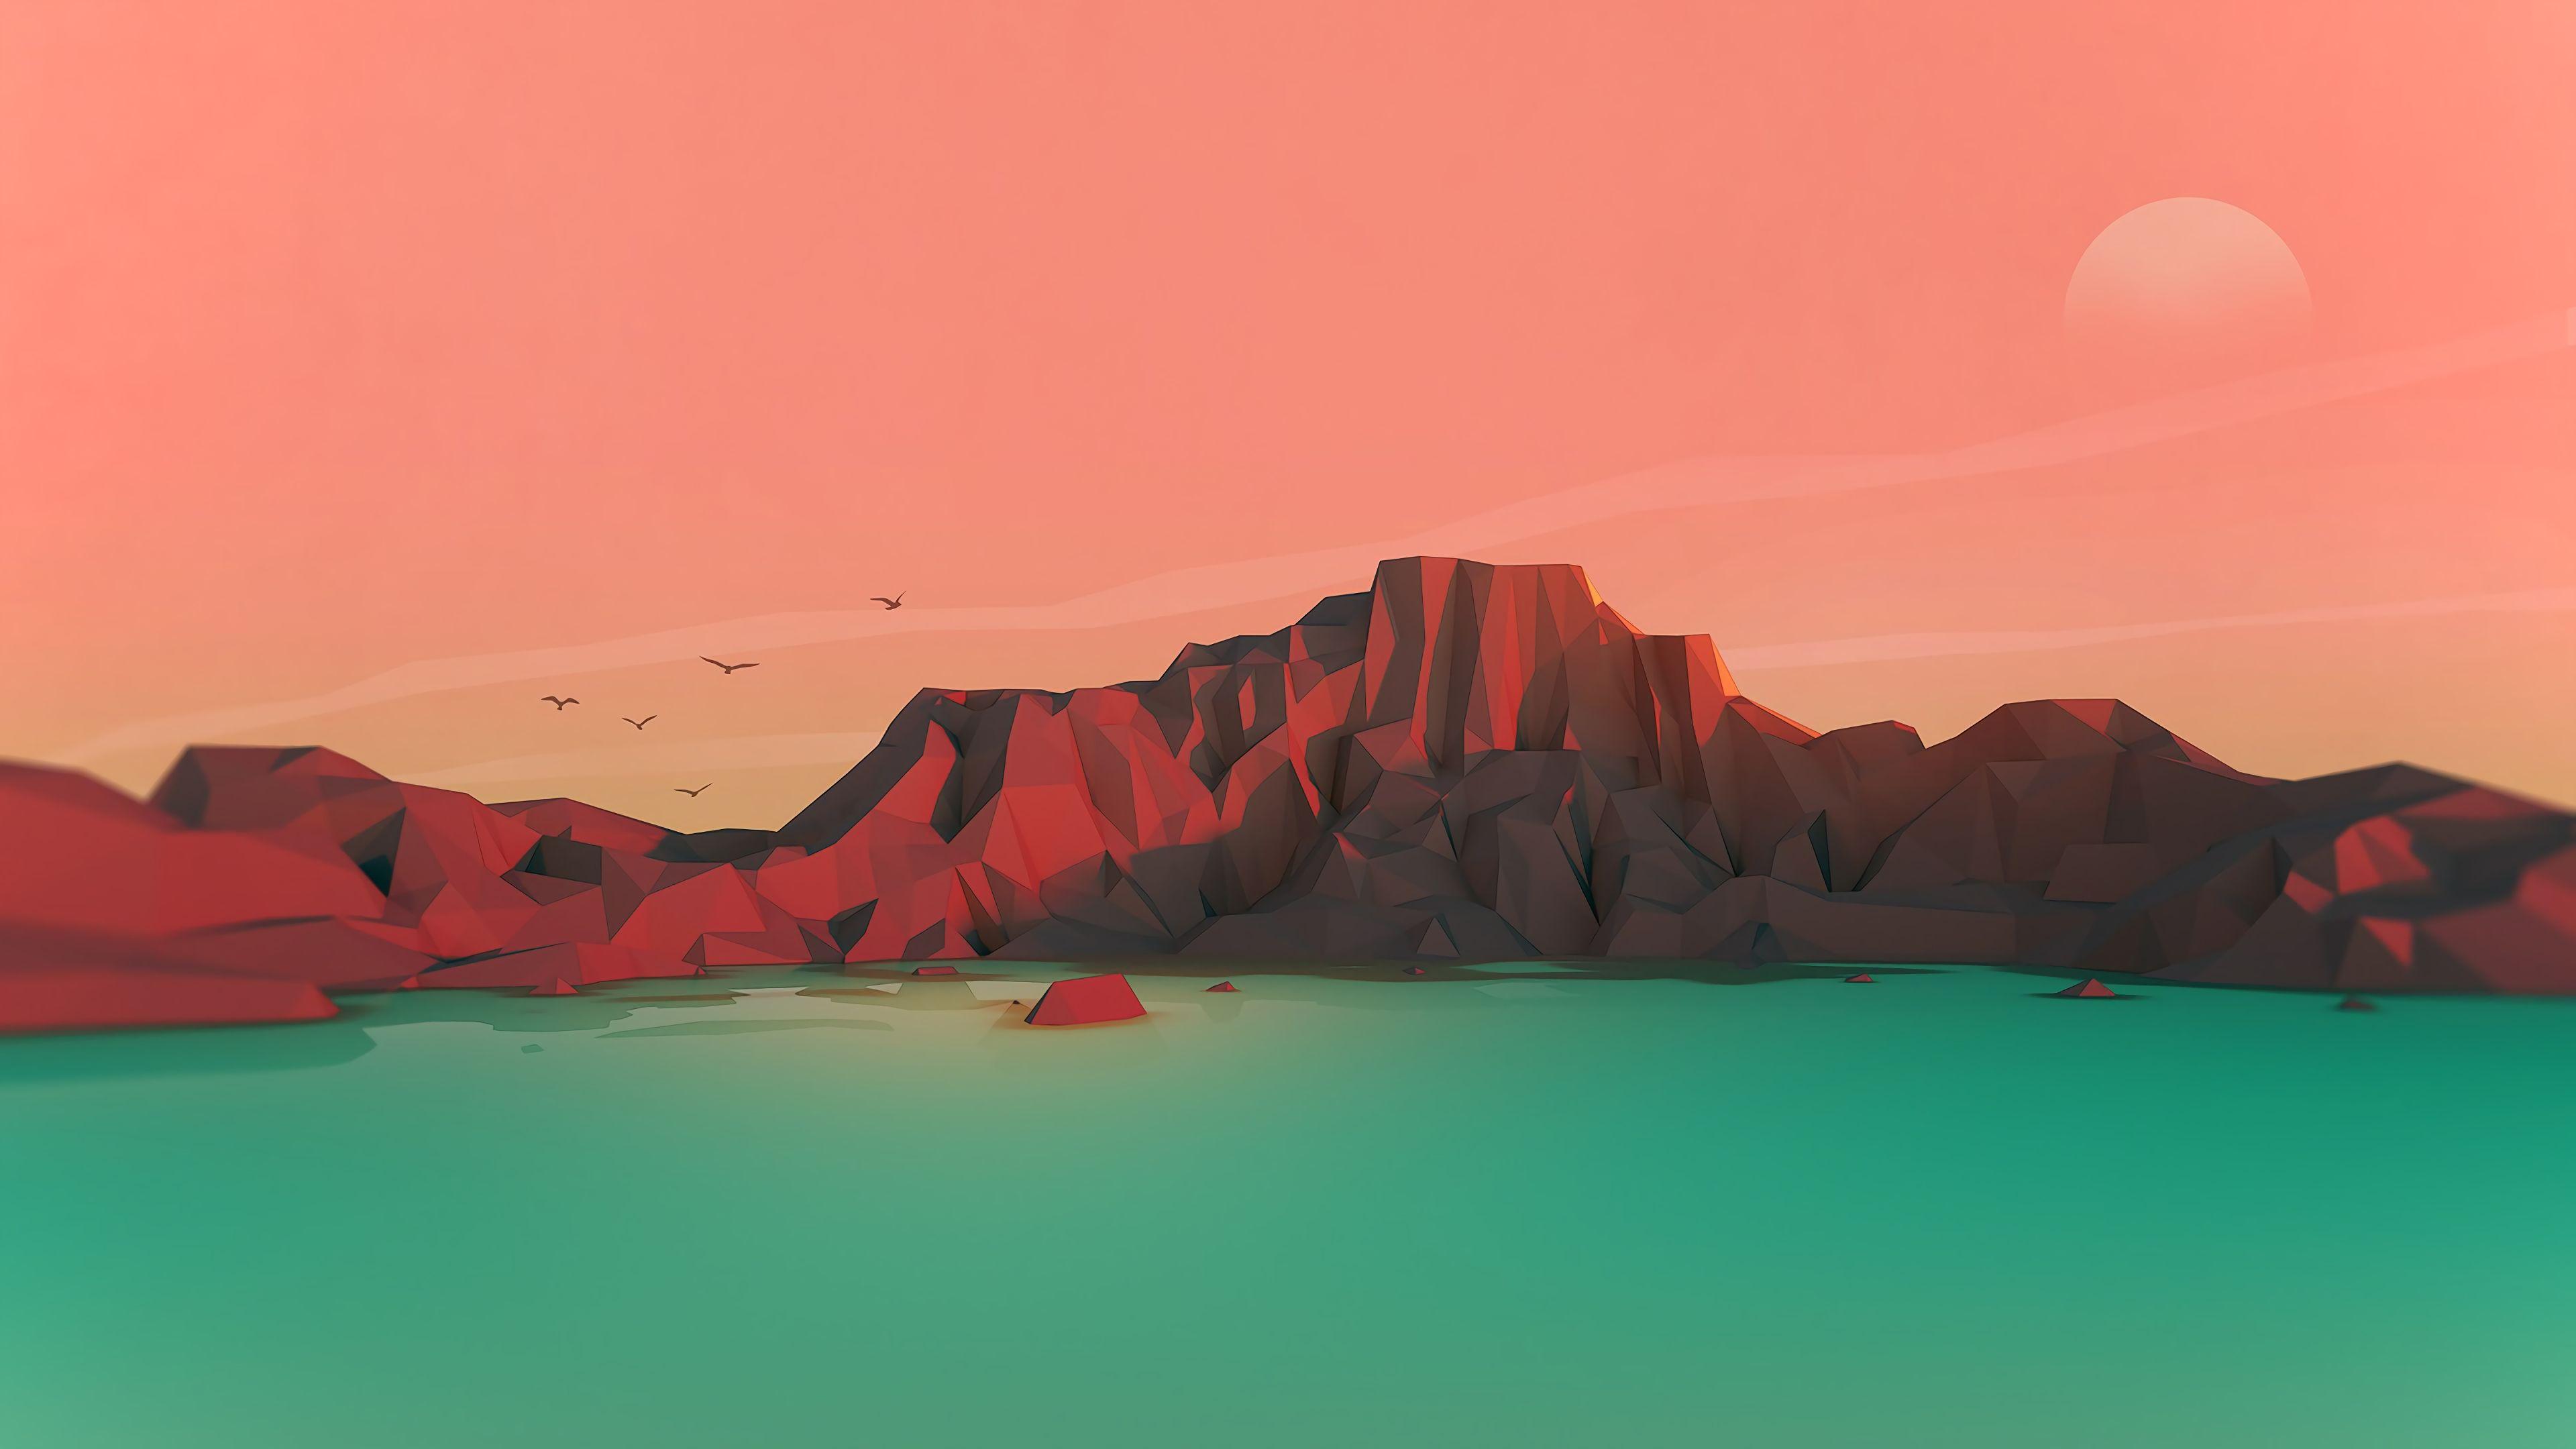 Landscape Low Poly Minimalist Minimalism 4K 21660